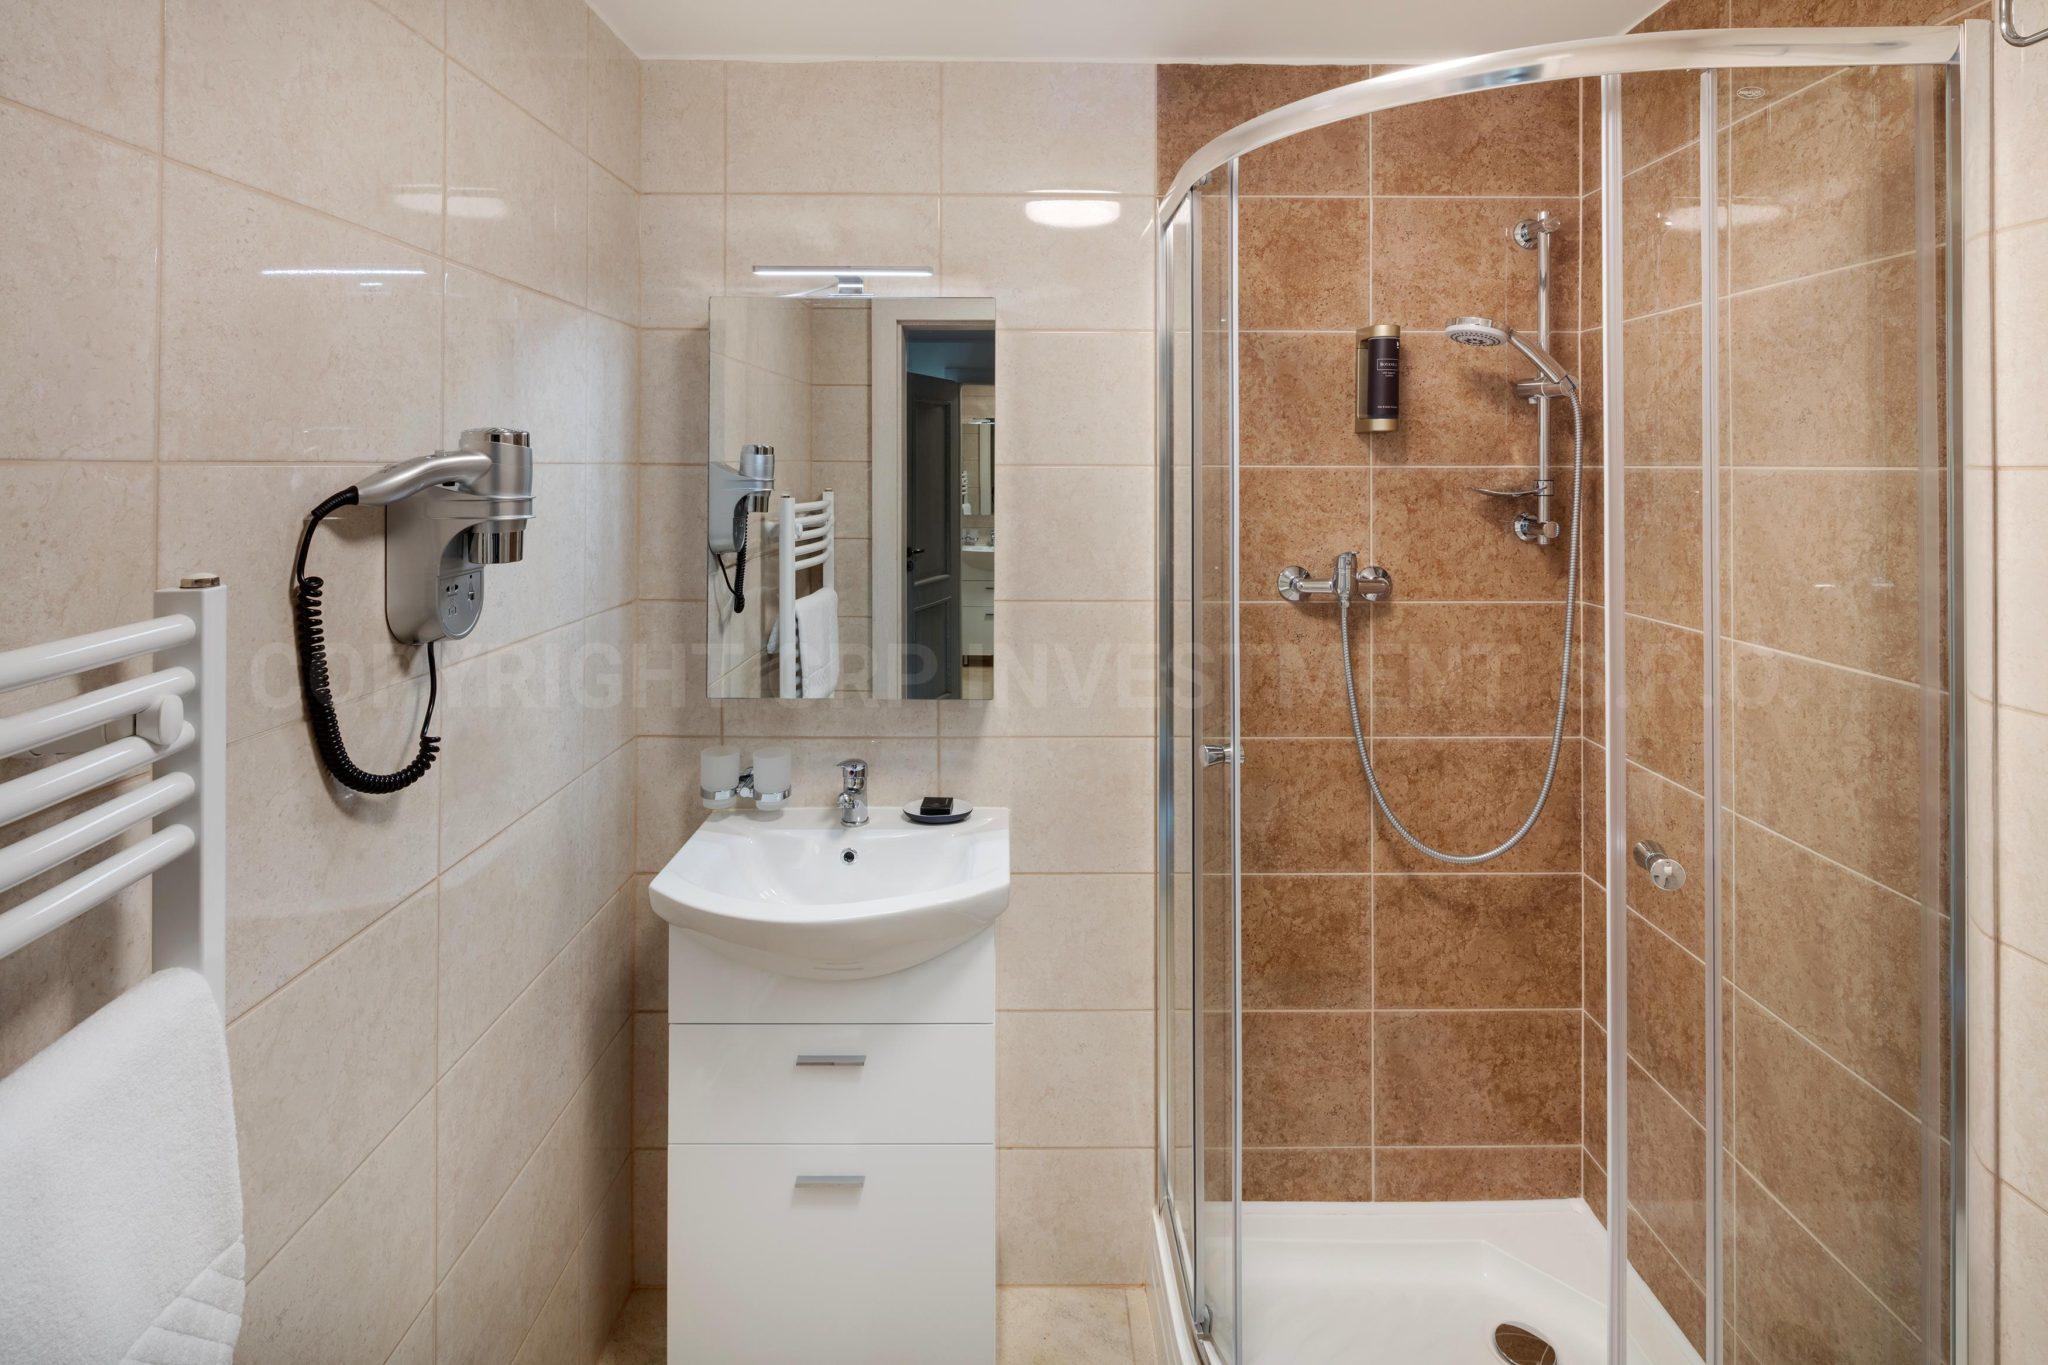 Private Wohnung zur Miete in Prag